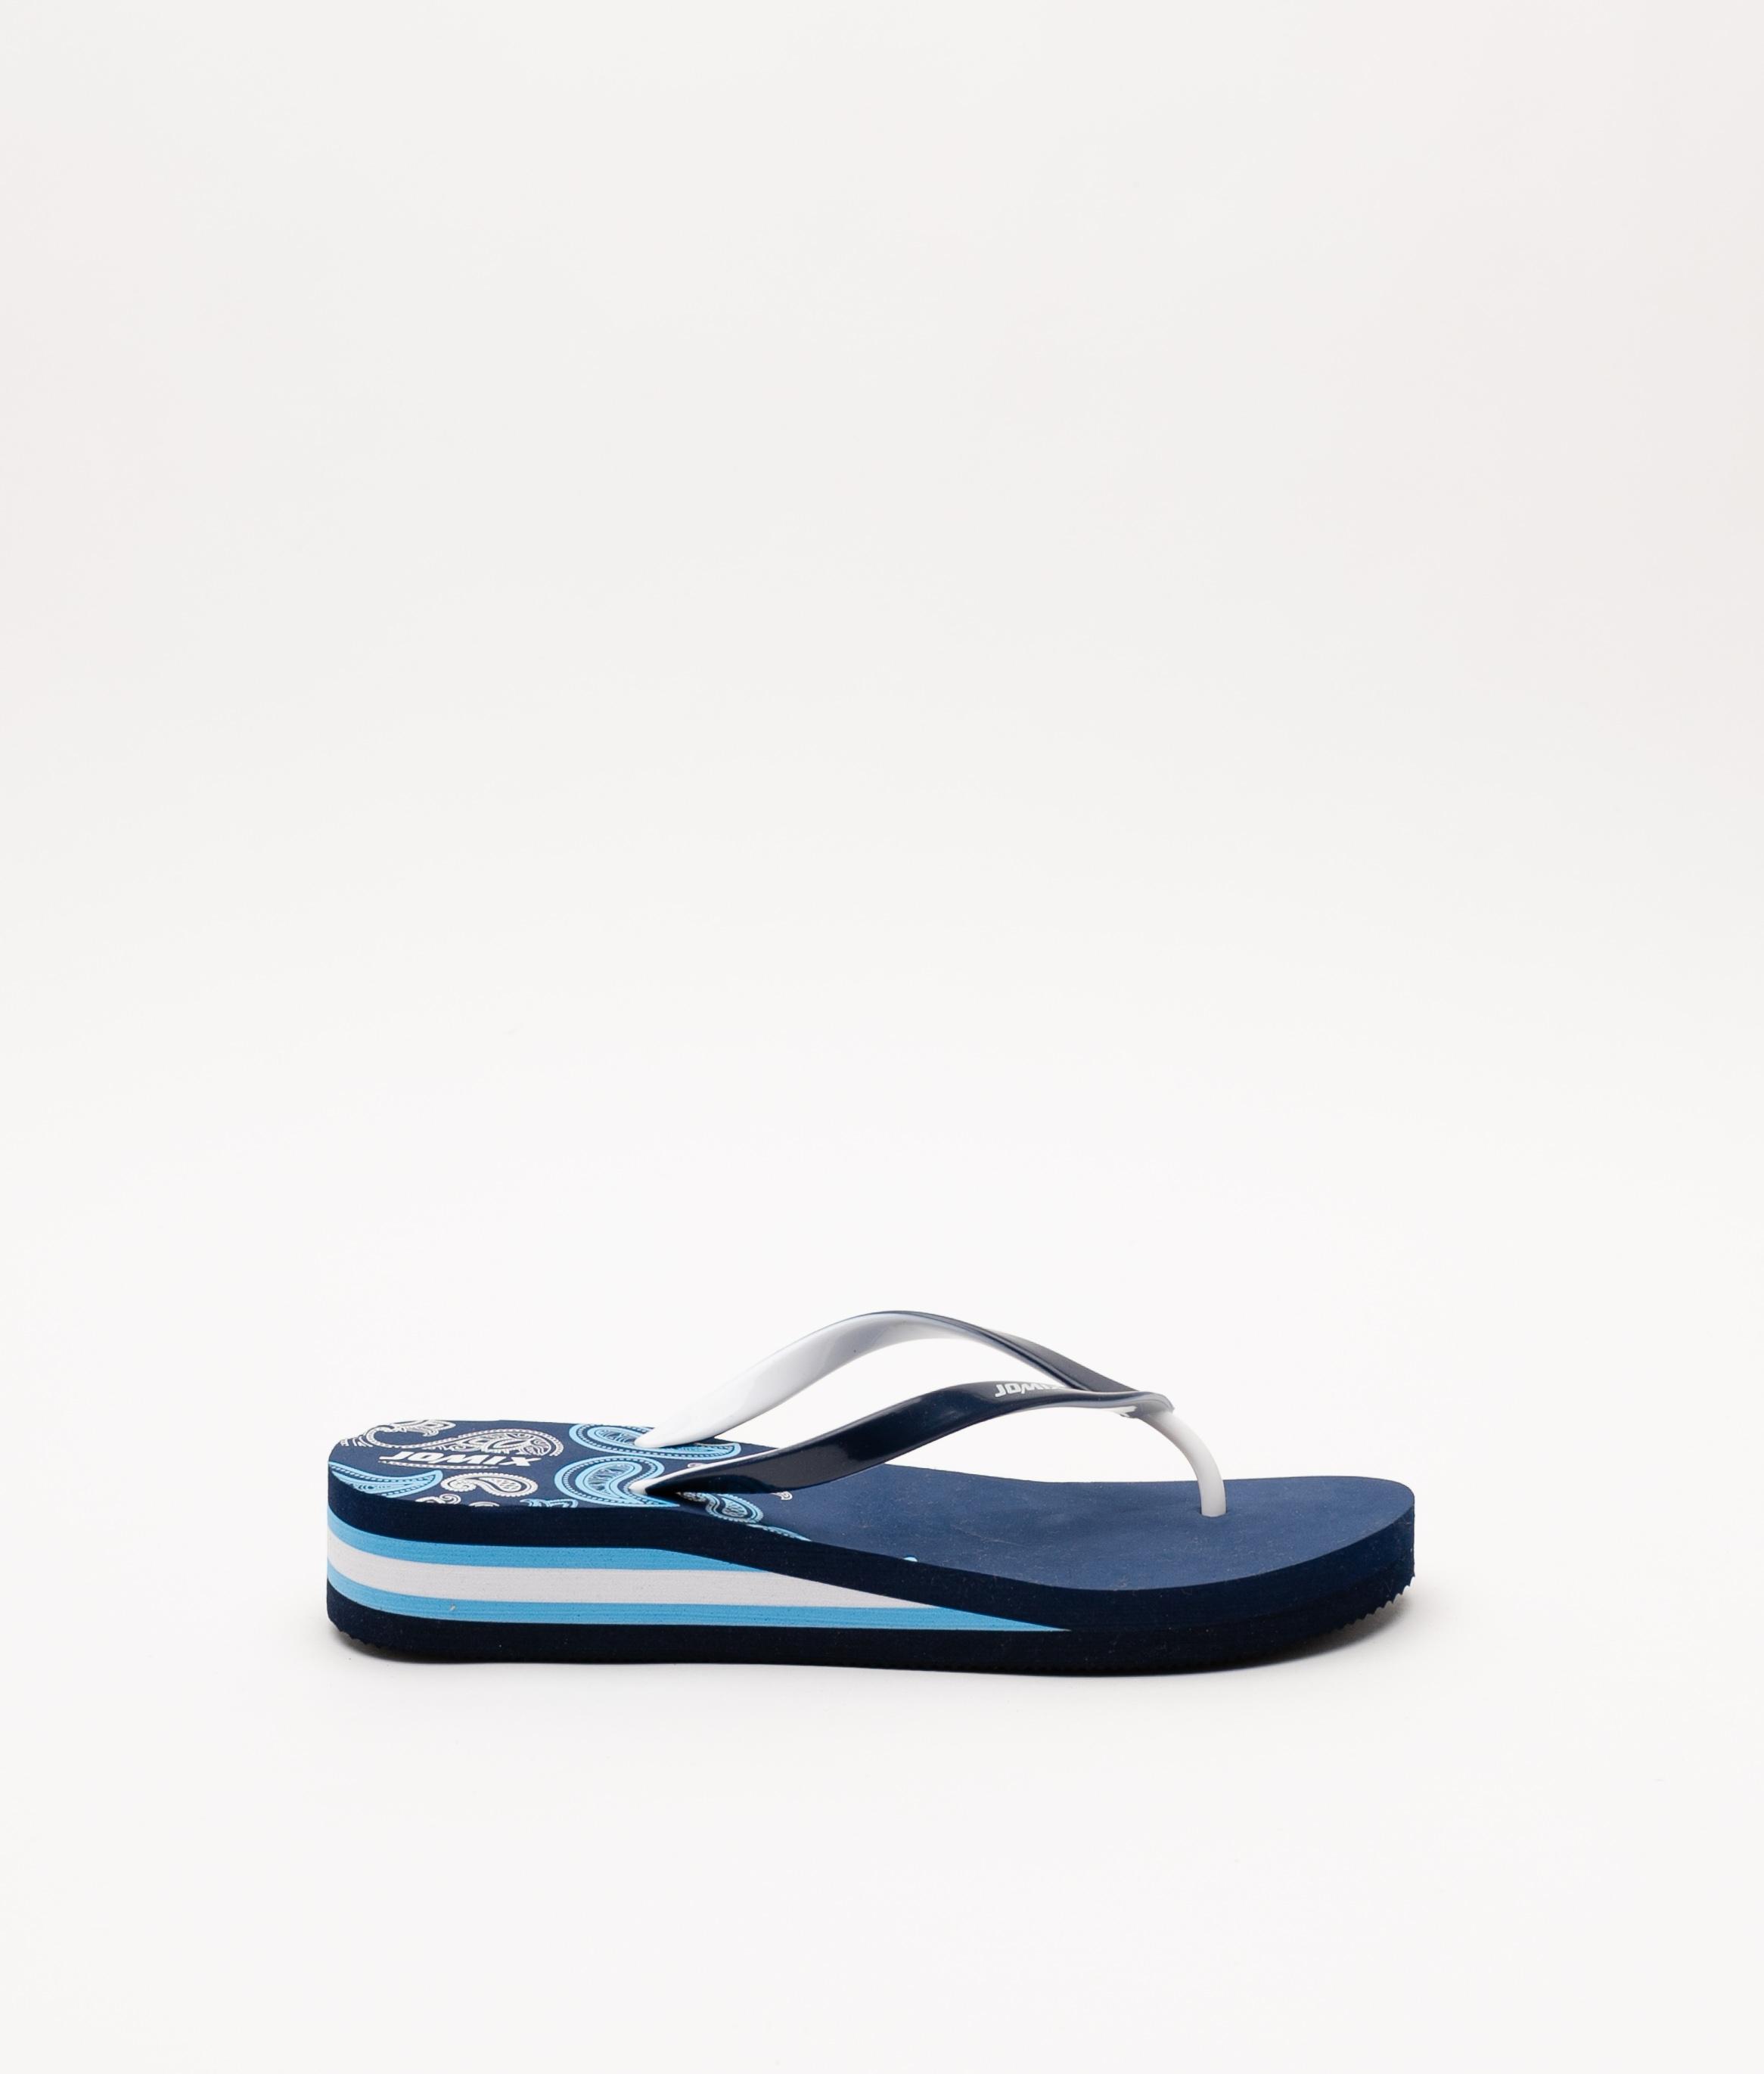 SANDAL CHEMIR - DARK BLUE